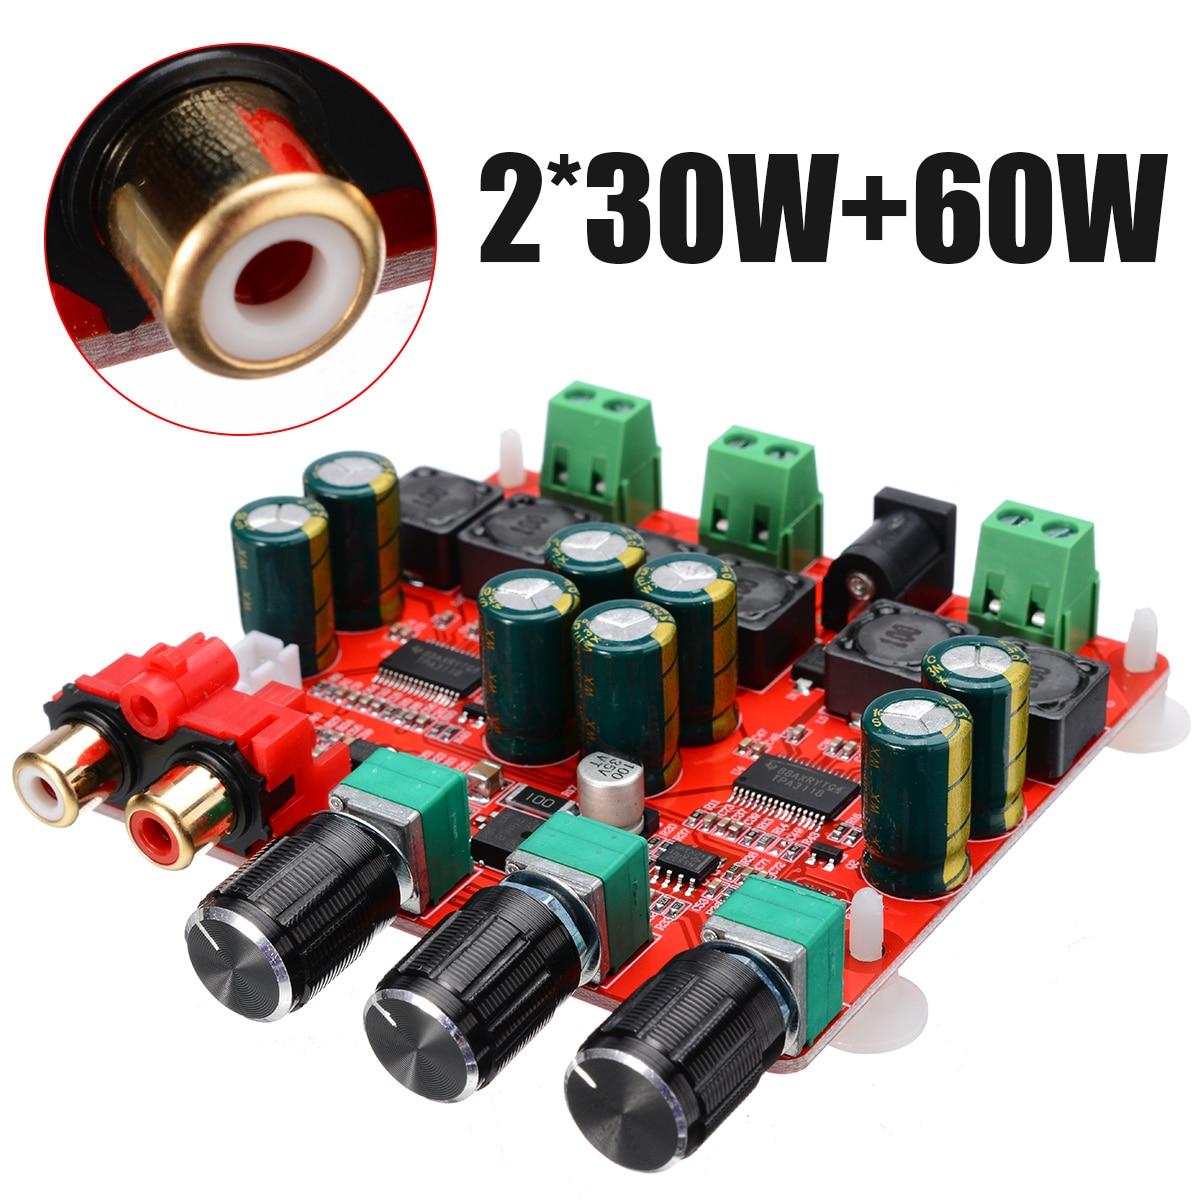 12V-26V DC TPA3118 Amplifier Boards 2x30W+60W 2.1 Channel Stereo Subwoofer Digital Power AMP Board For Speaker Audio